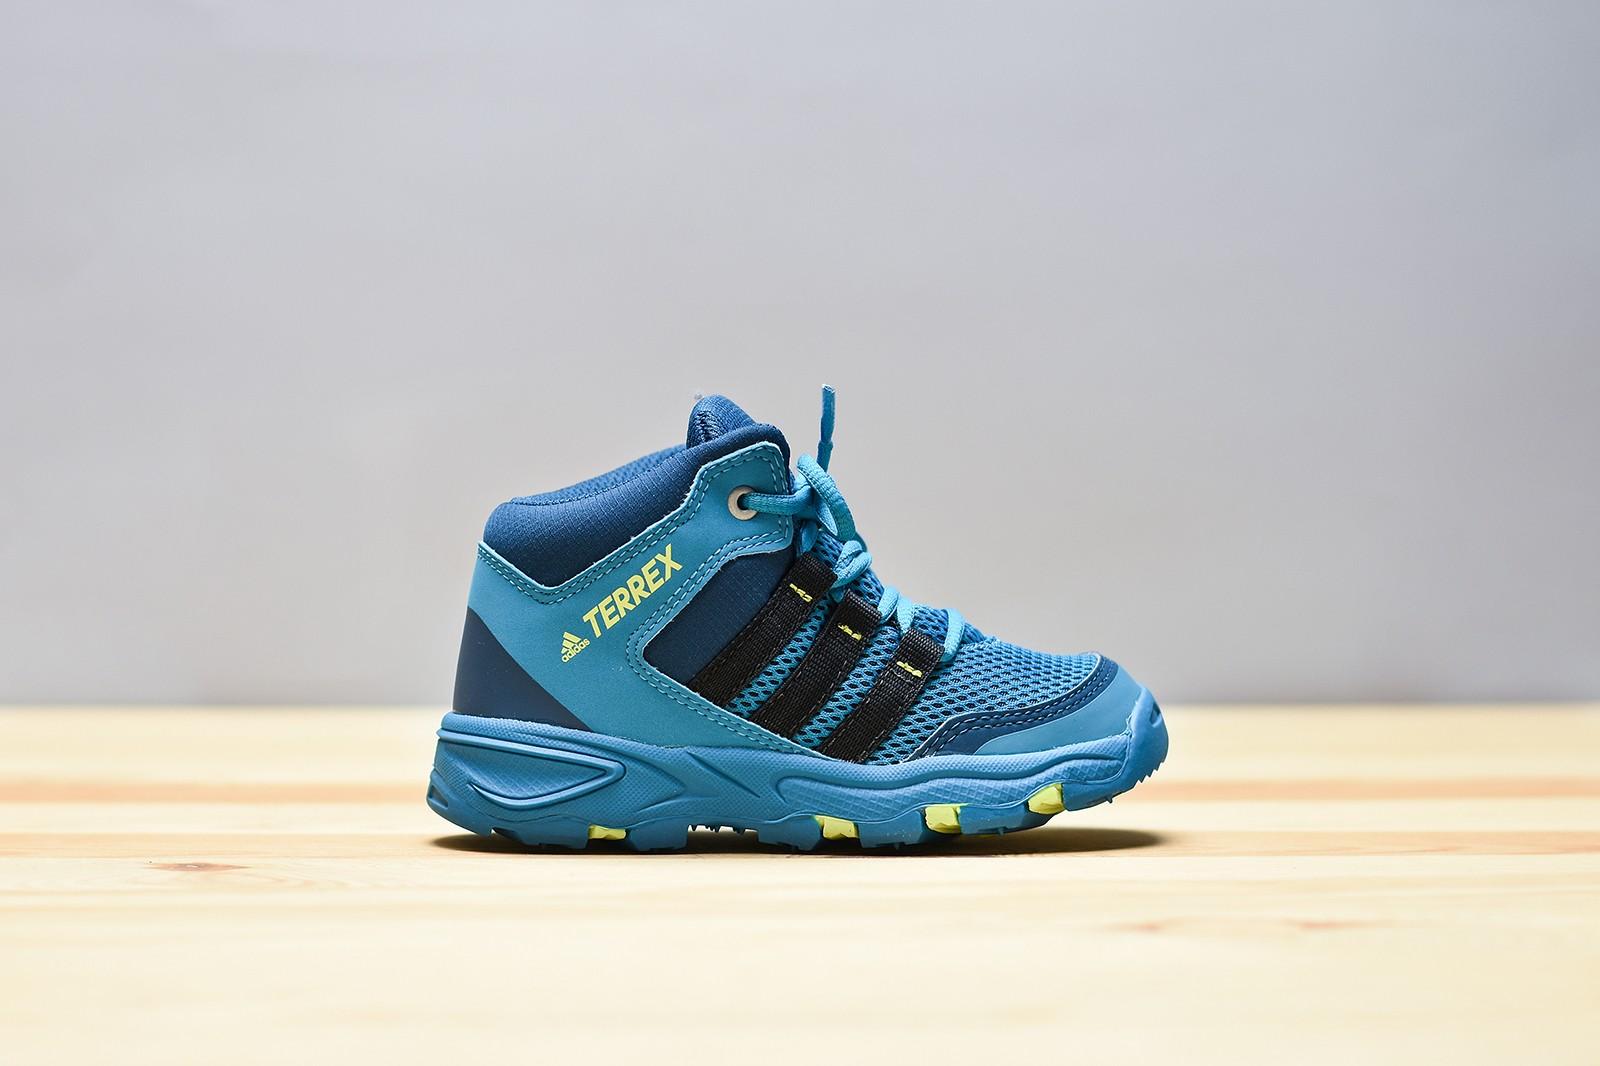 54ec0791305 Dětská treková obuv adidas Performance AX2 MID I